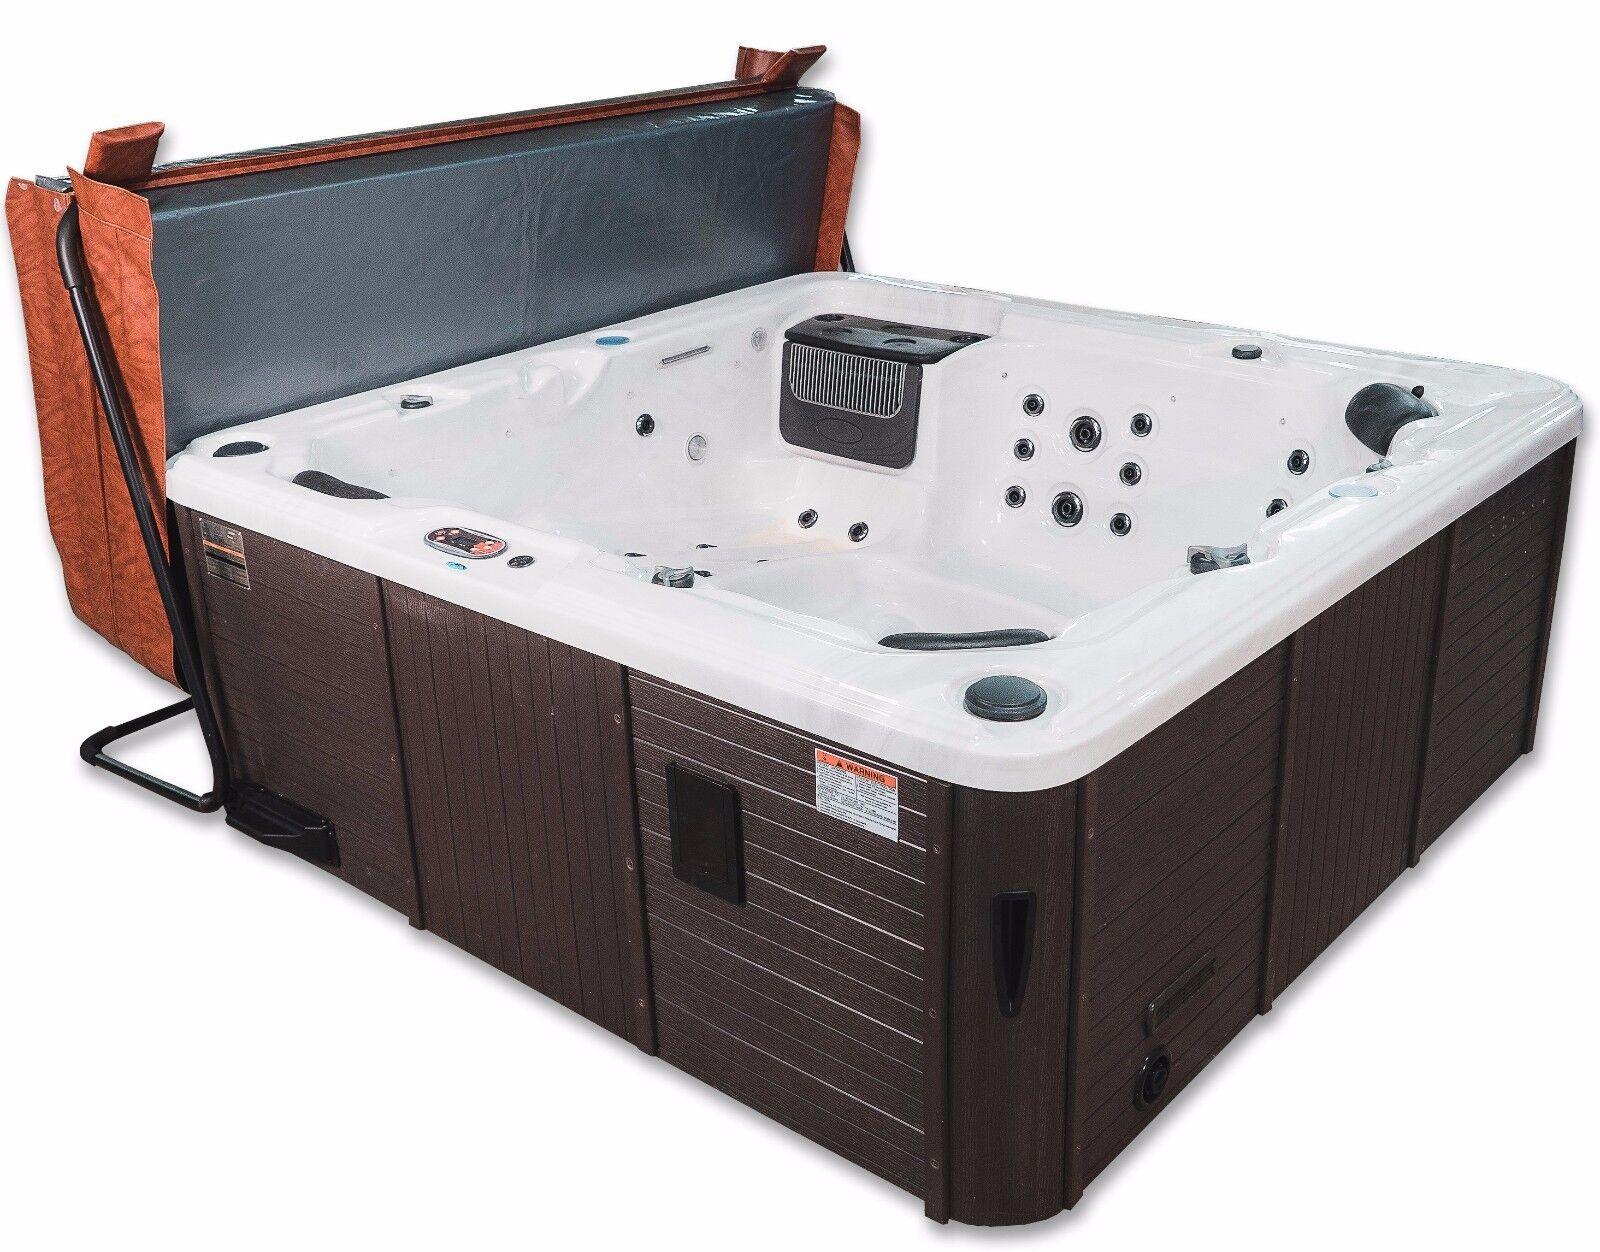 Canadian Hot Tub Spa In A Box